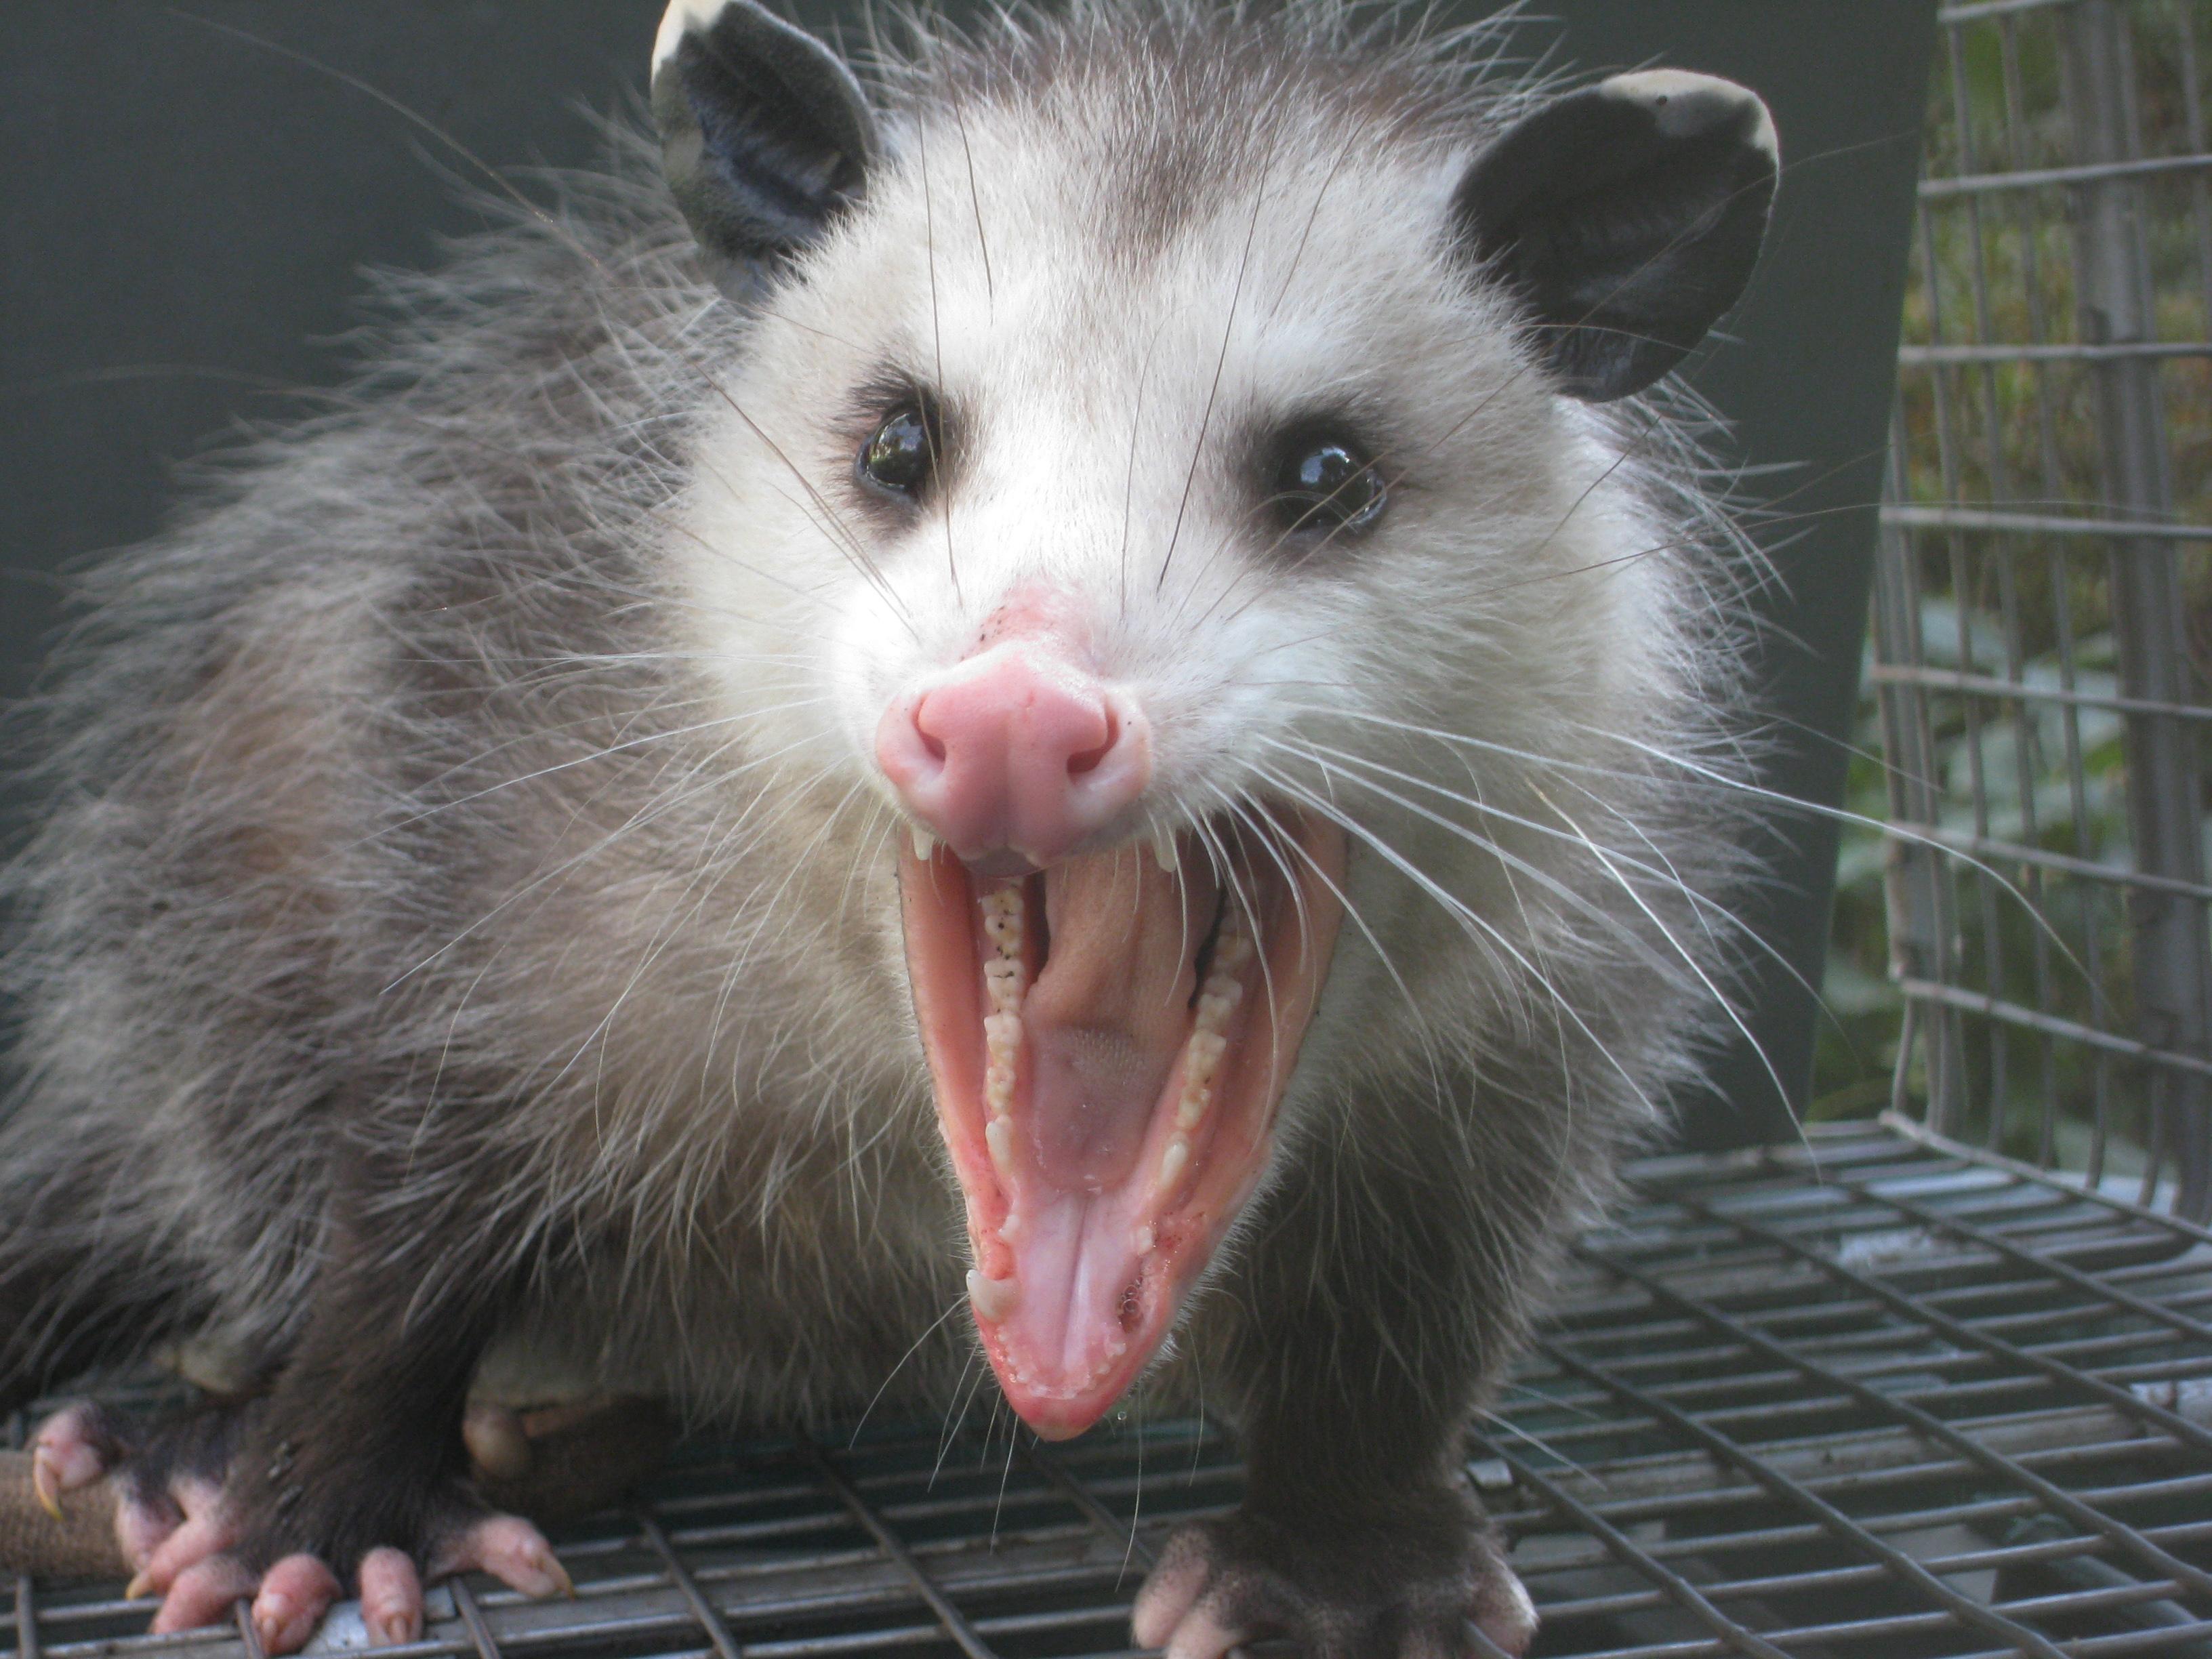 https://pophaydn.files.wordpress.com/2011/10/opossum1.jpg